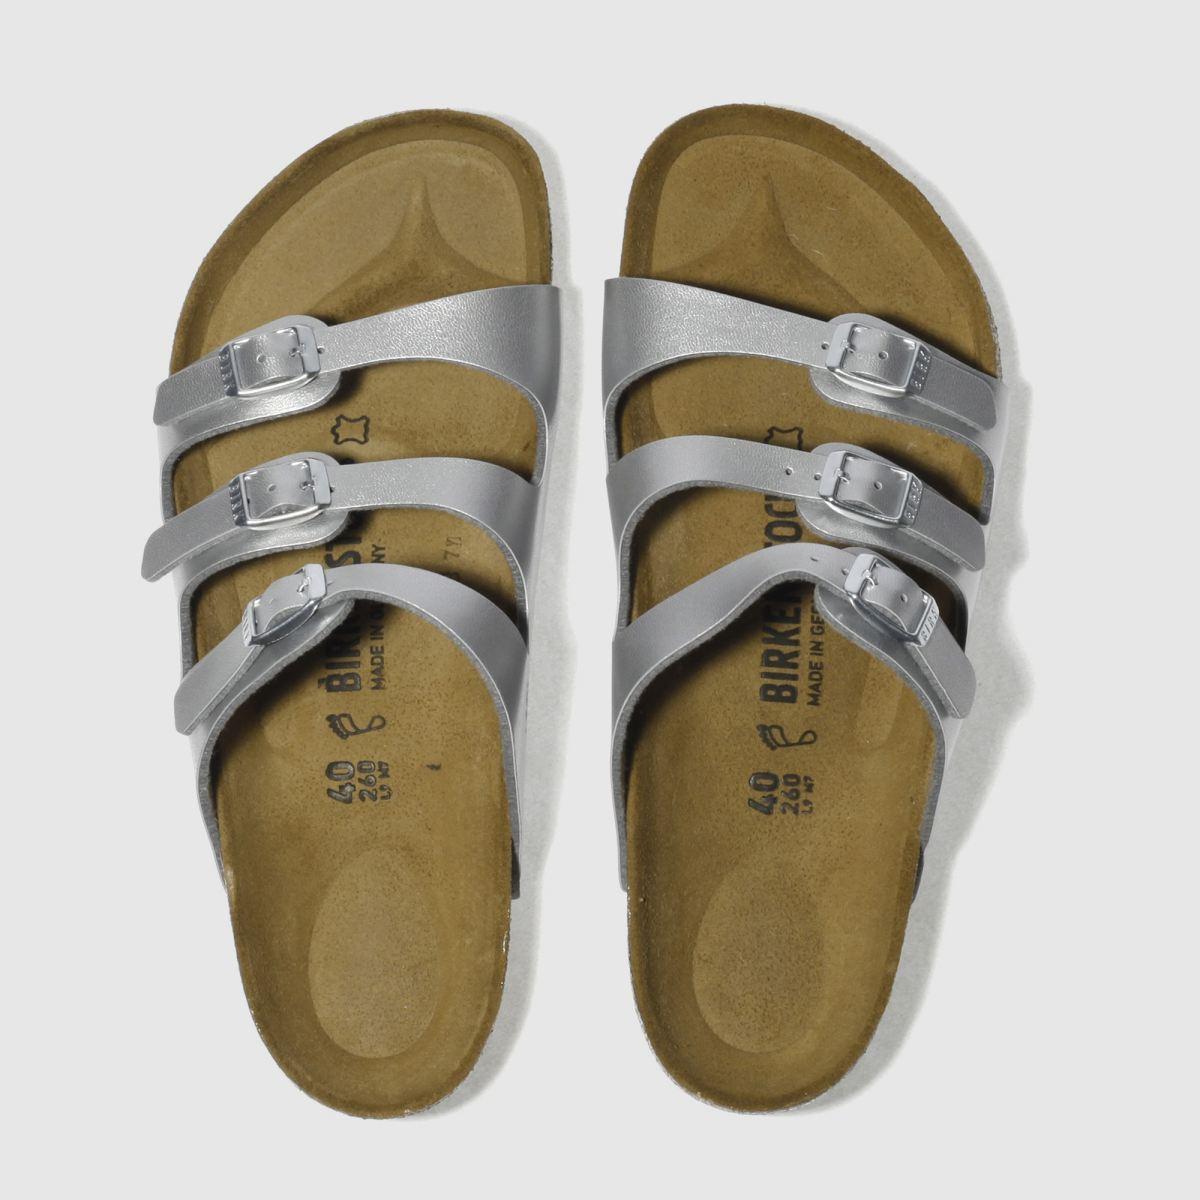 Birkenstock Silver Florida Sandals